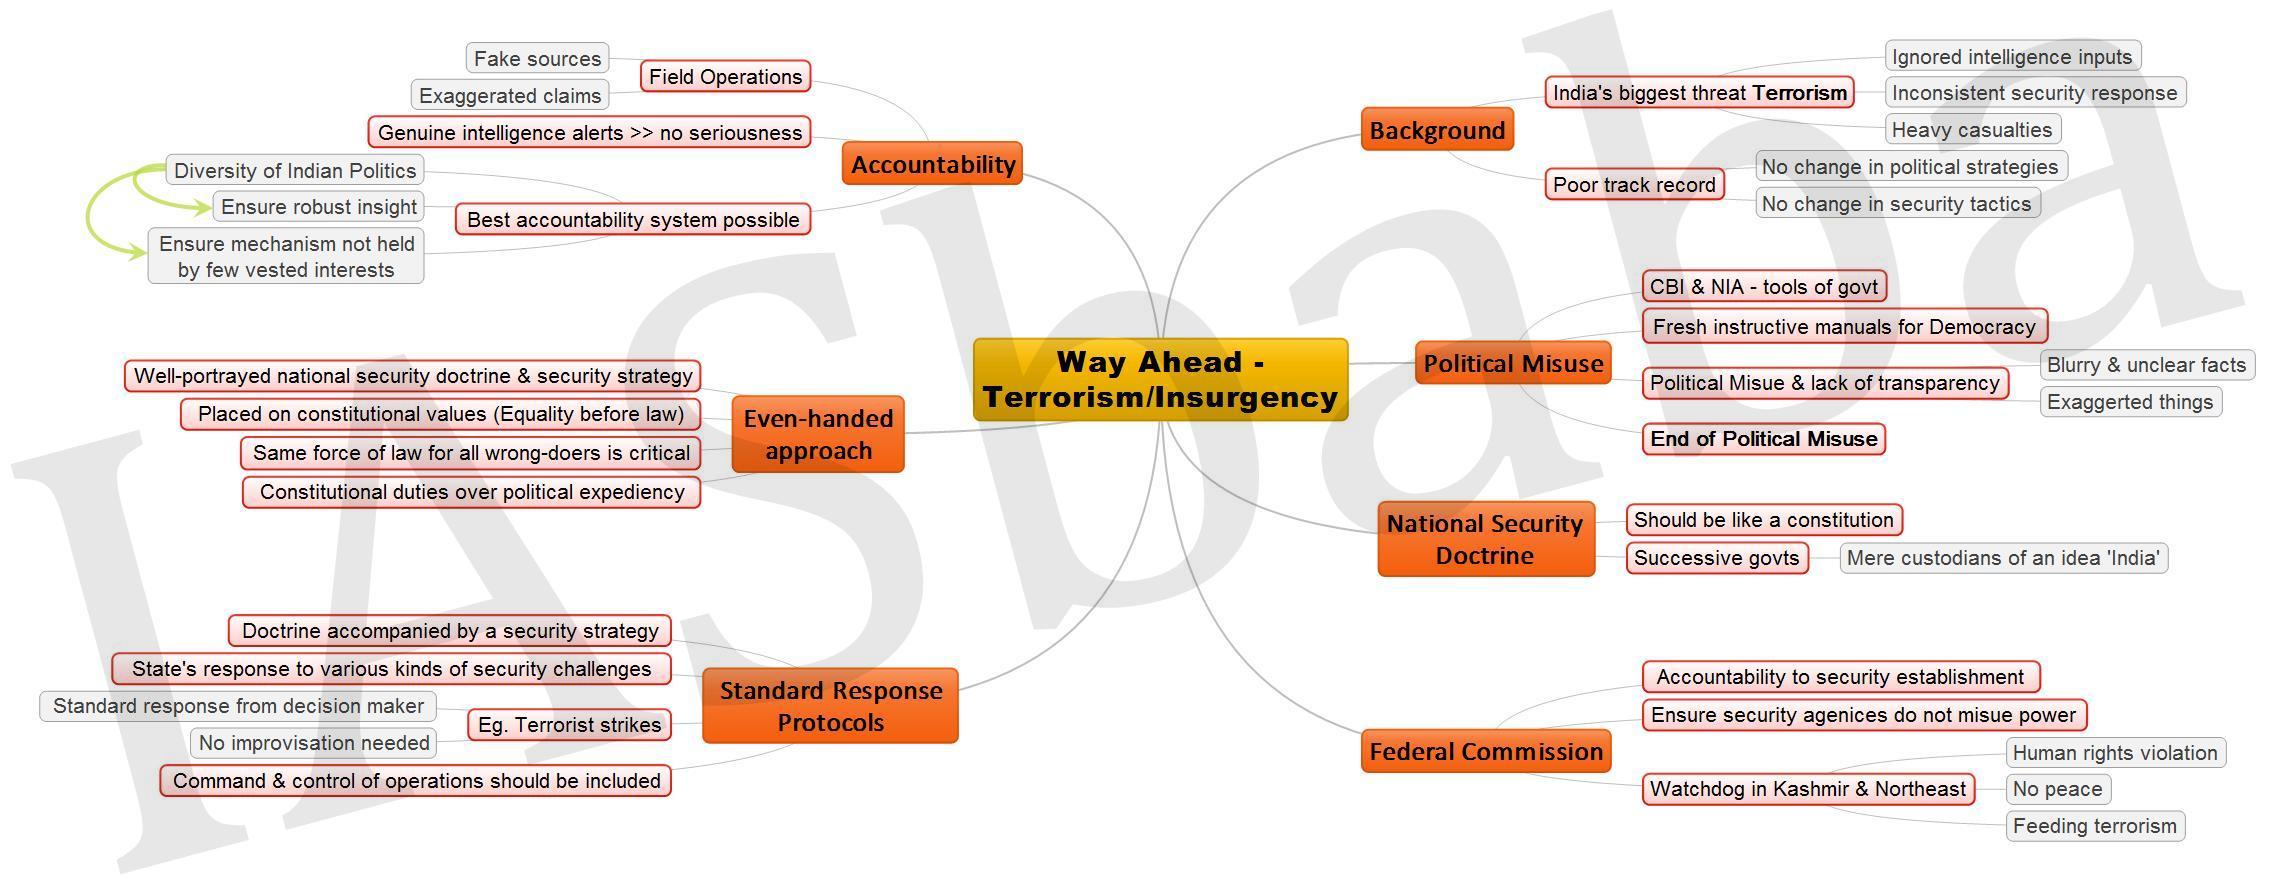 Way Ahead TerrorismInsurgency JPEG